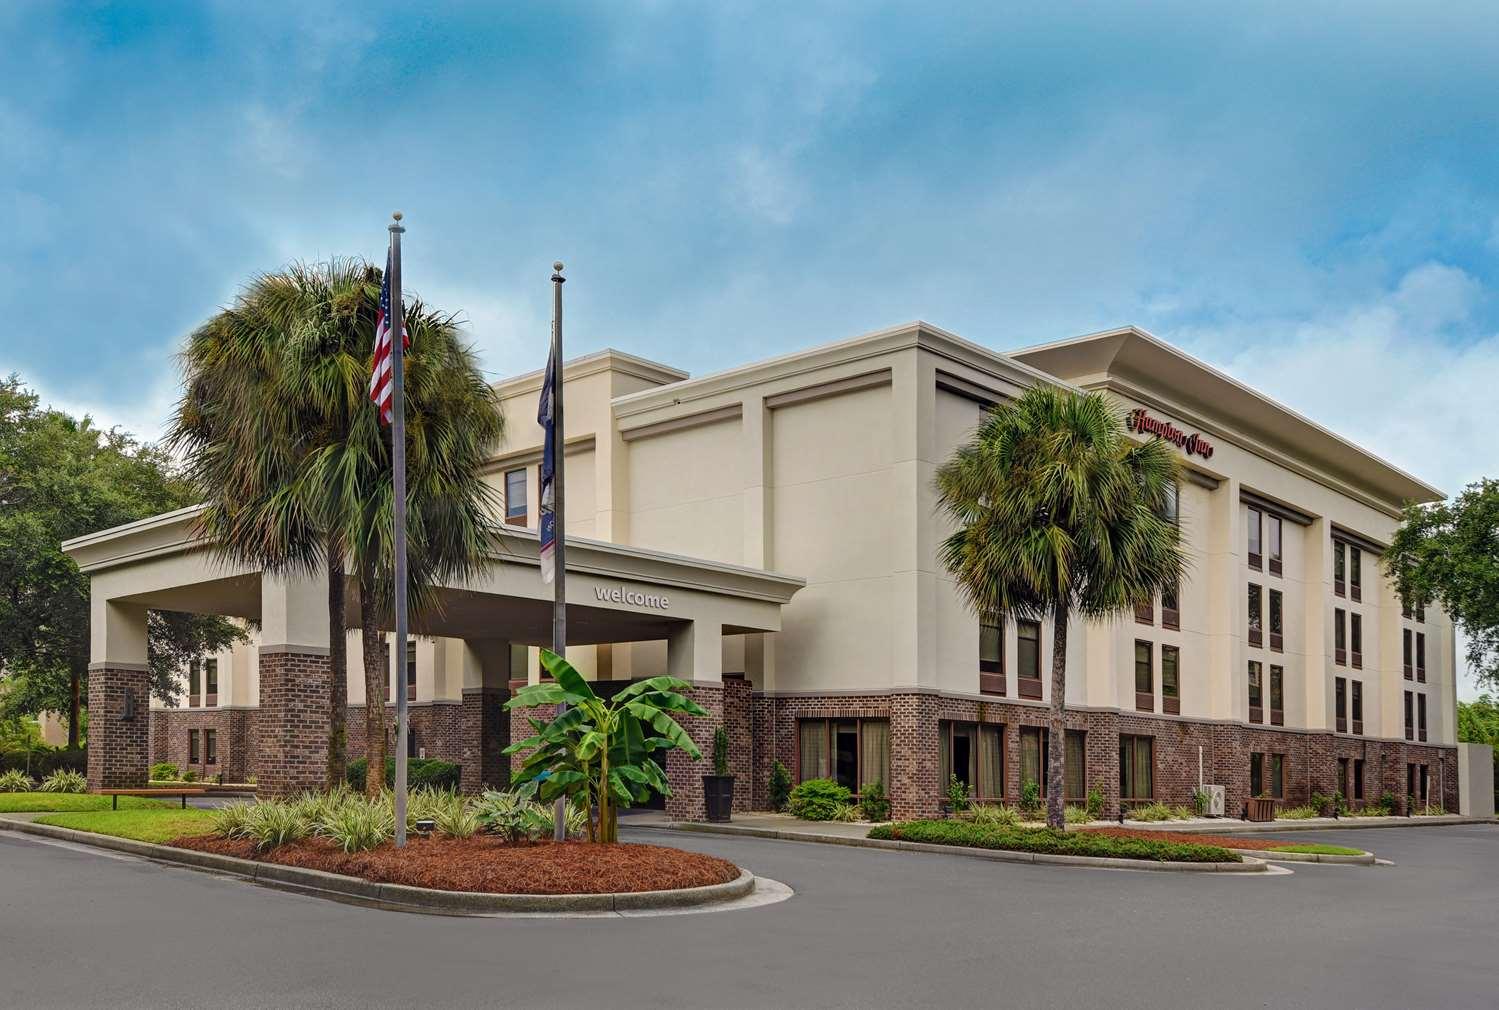 hotels near patriots point mt pleasant south carolina. Black Bedroom Furniture Sets. Home Design Ideas